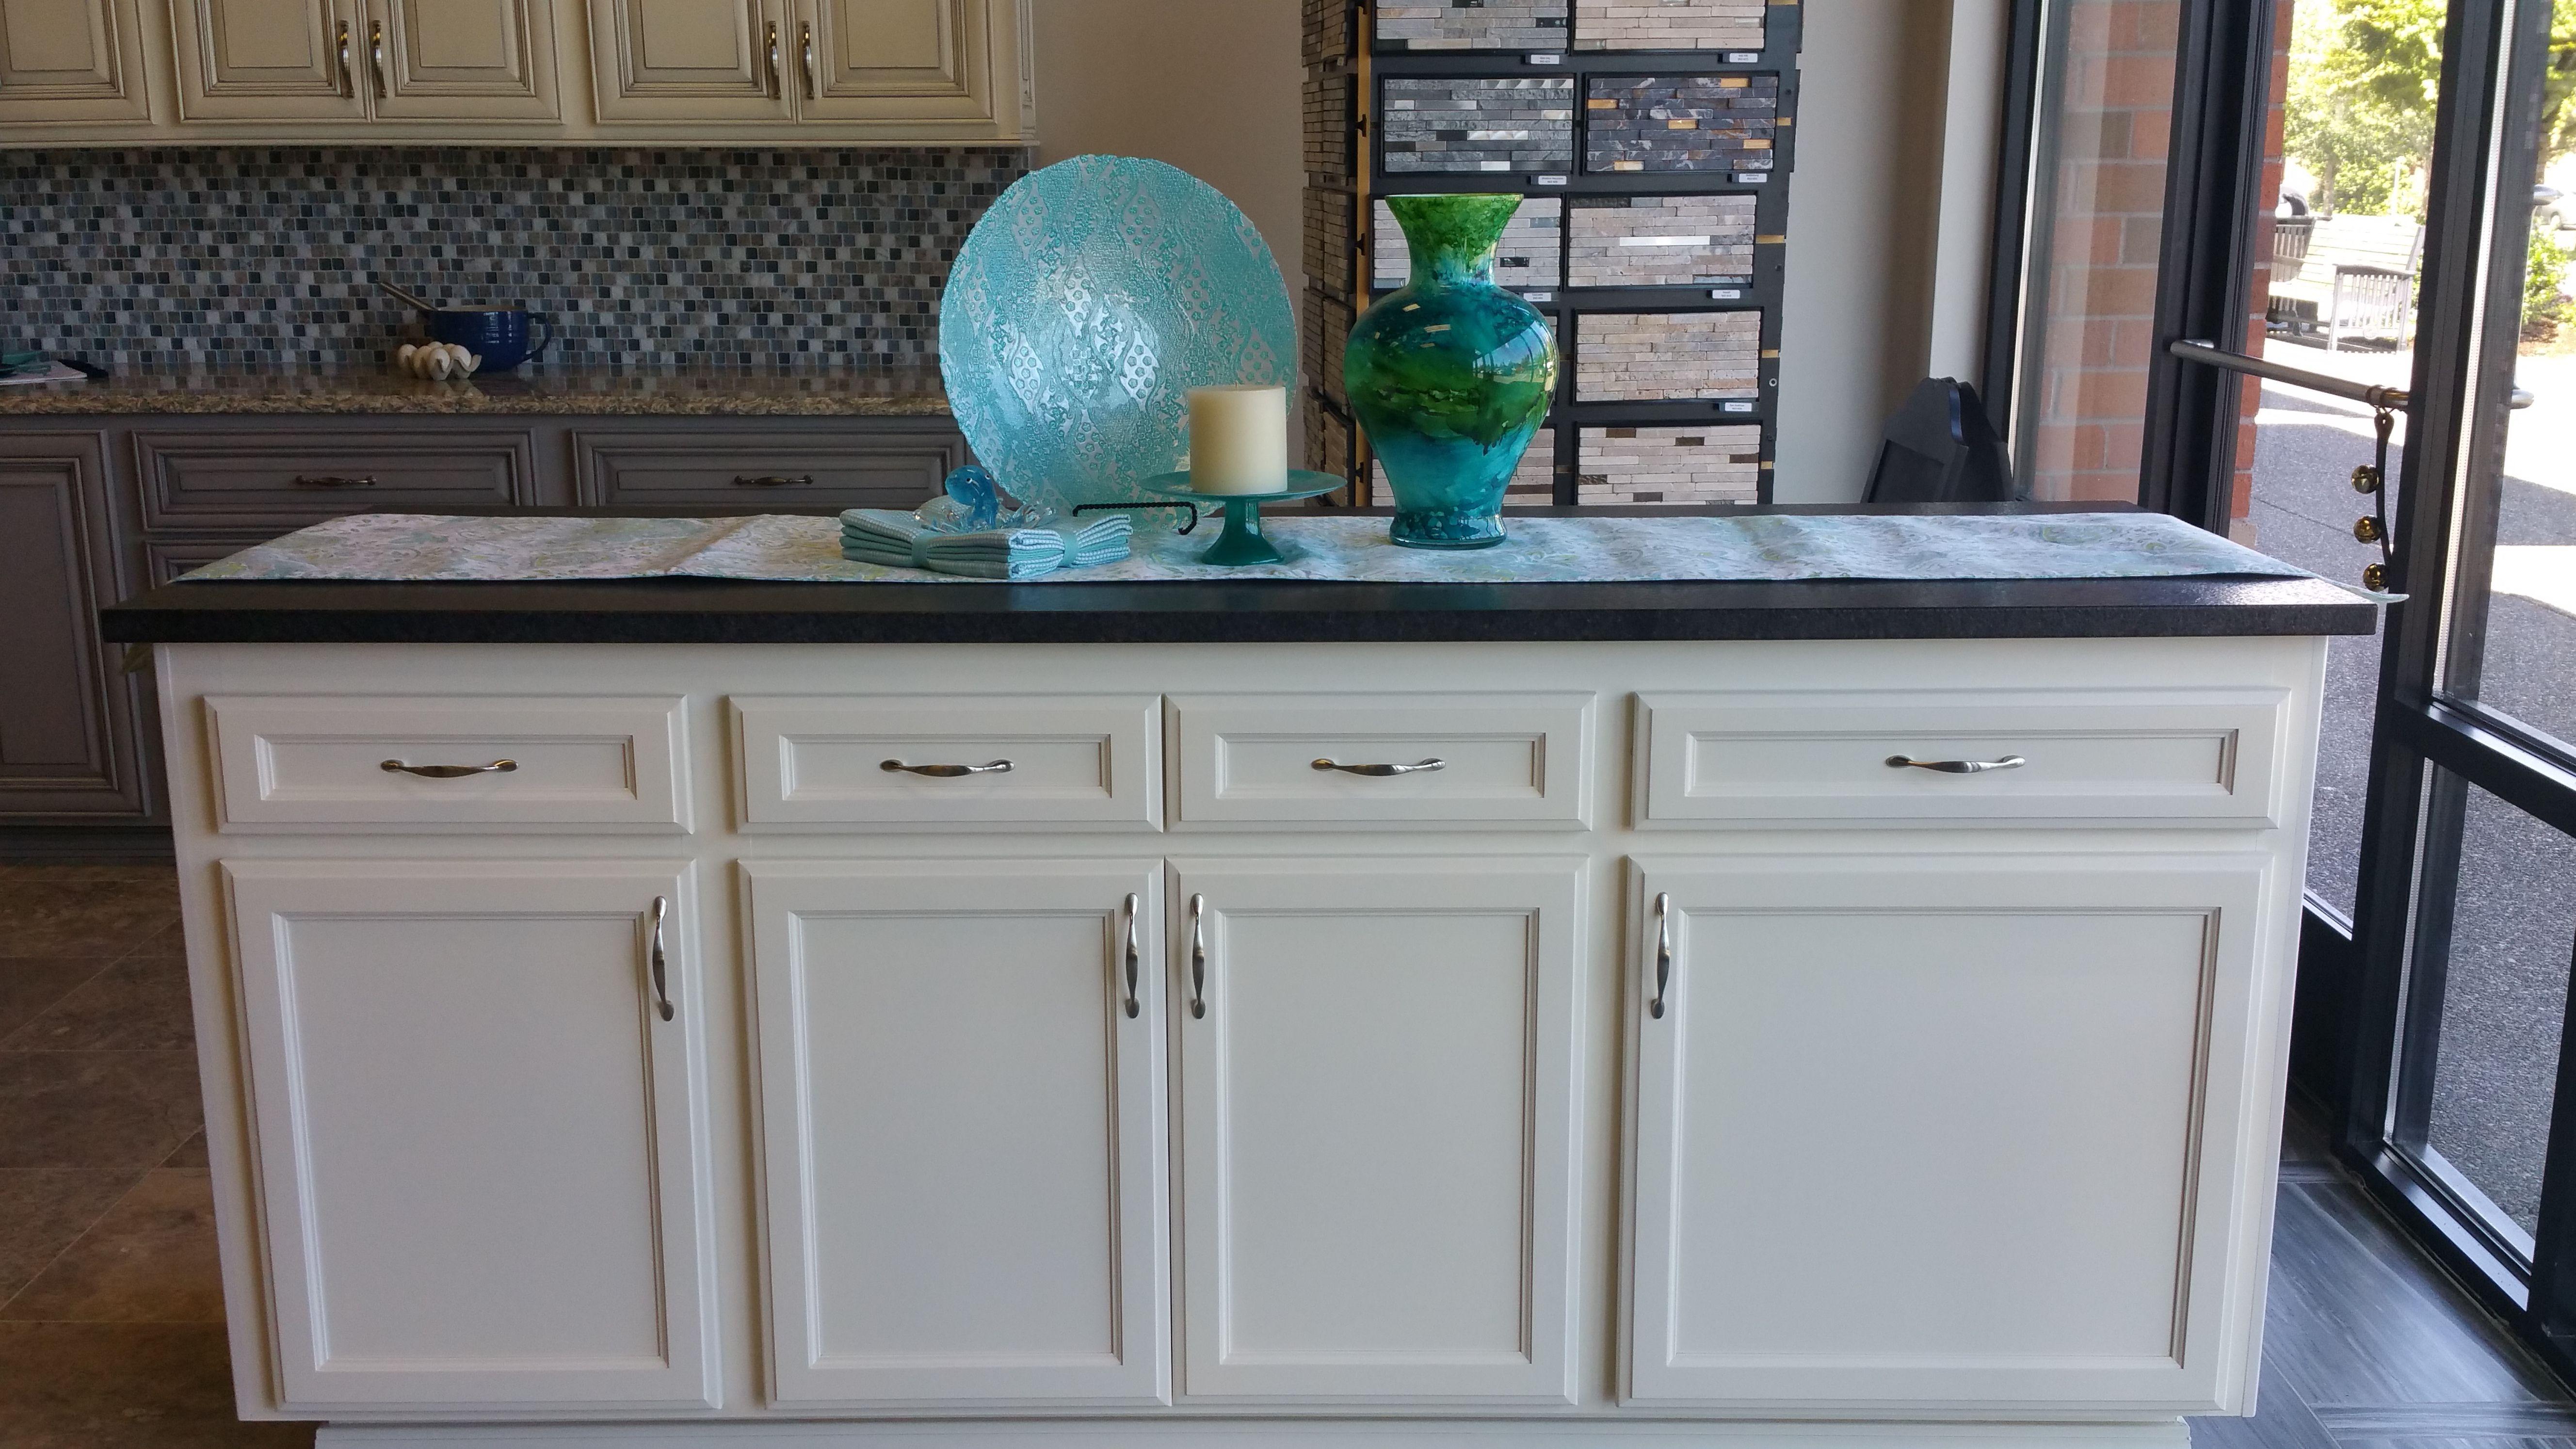 White Kitchen Cabinets Refinishing Cabinets Kitchen Design Centre Kitchen Cabinets